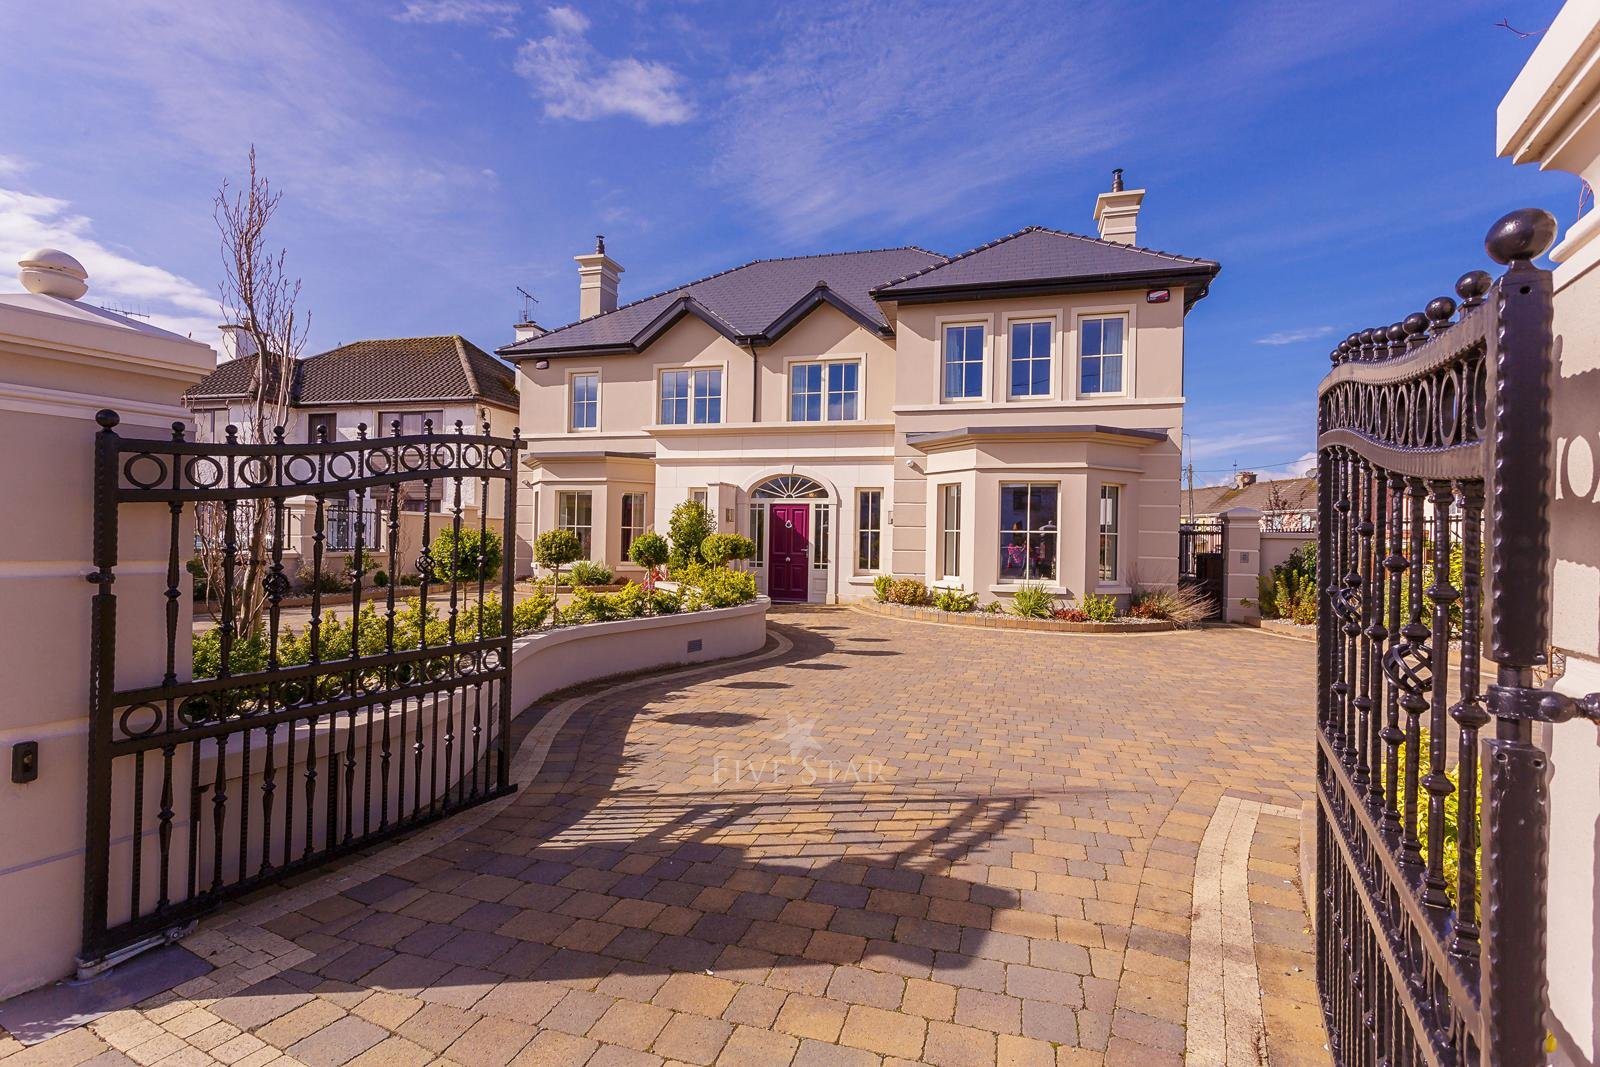 5-Star Killarney Residence photo 2